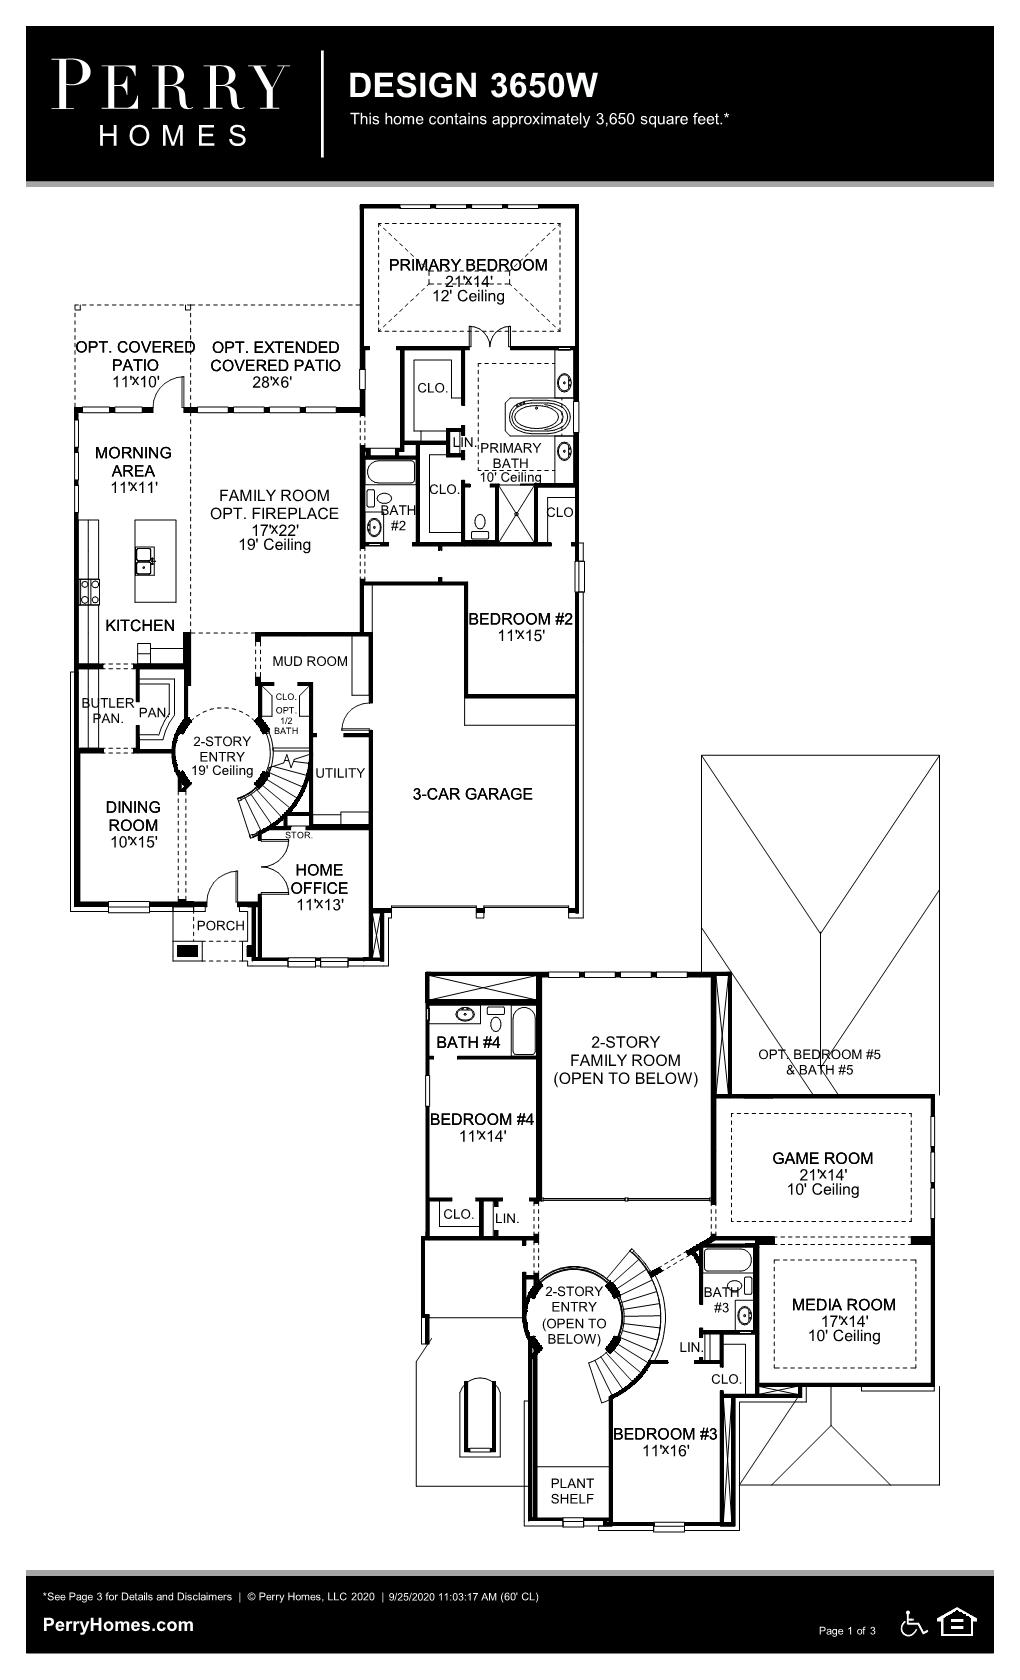 Floor Plan for 3650W